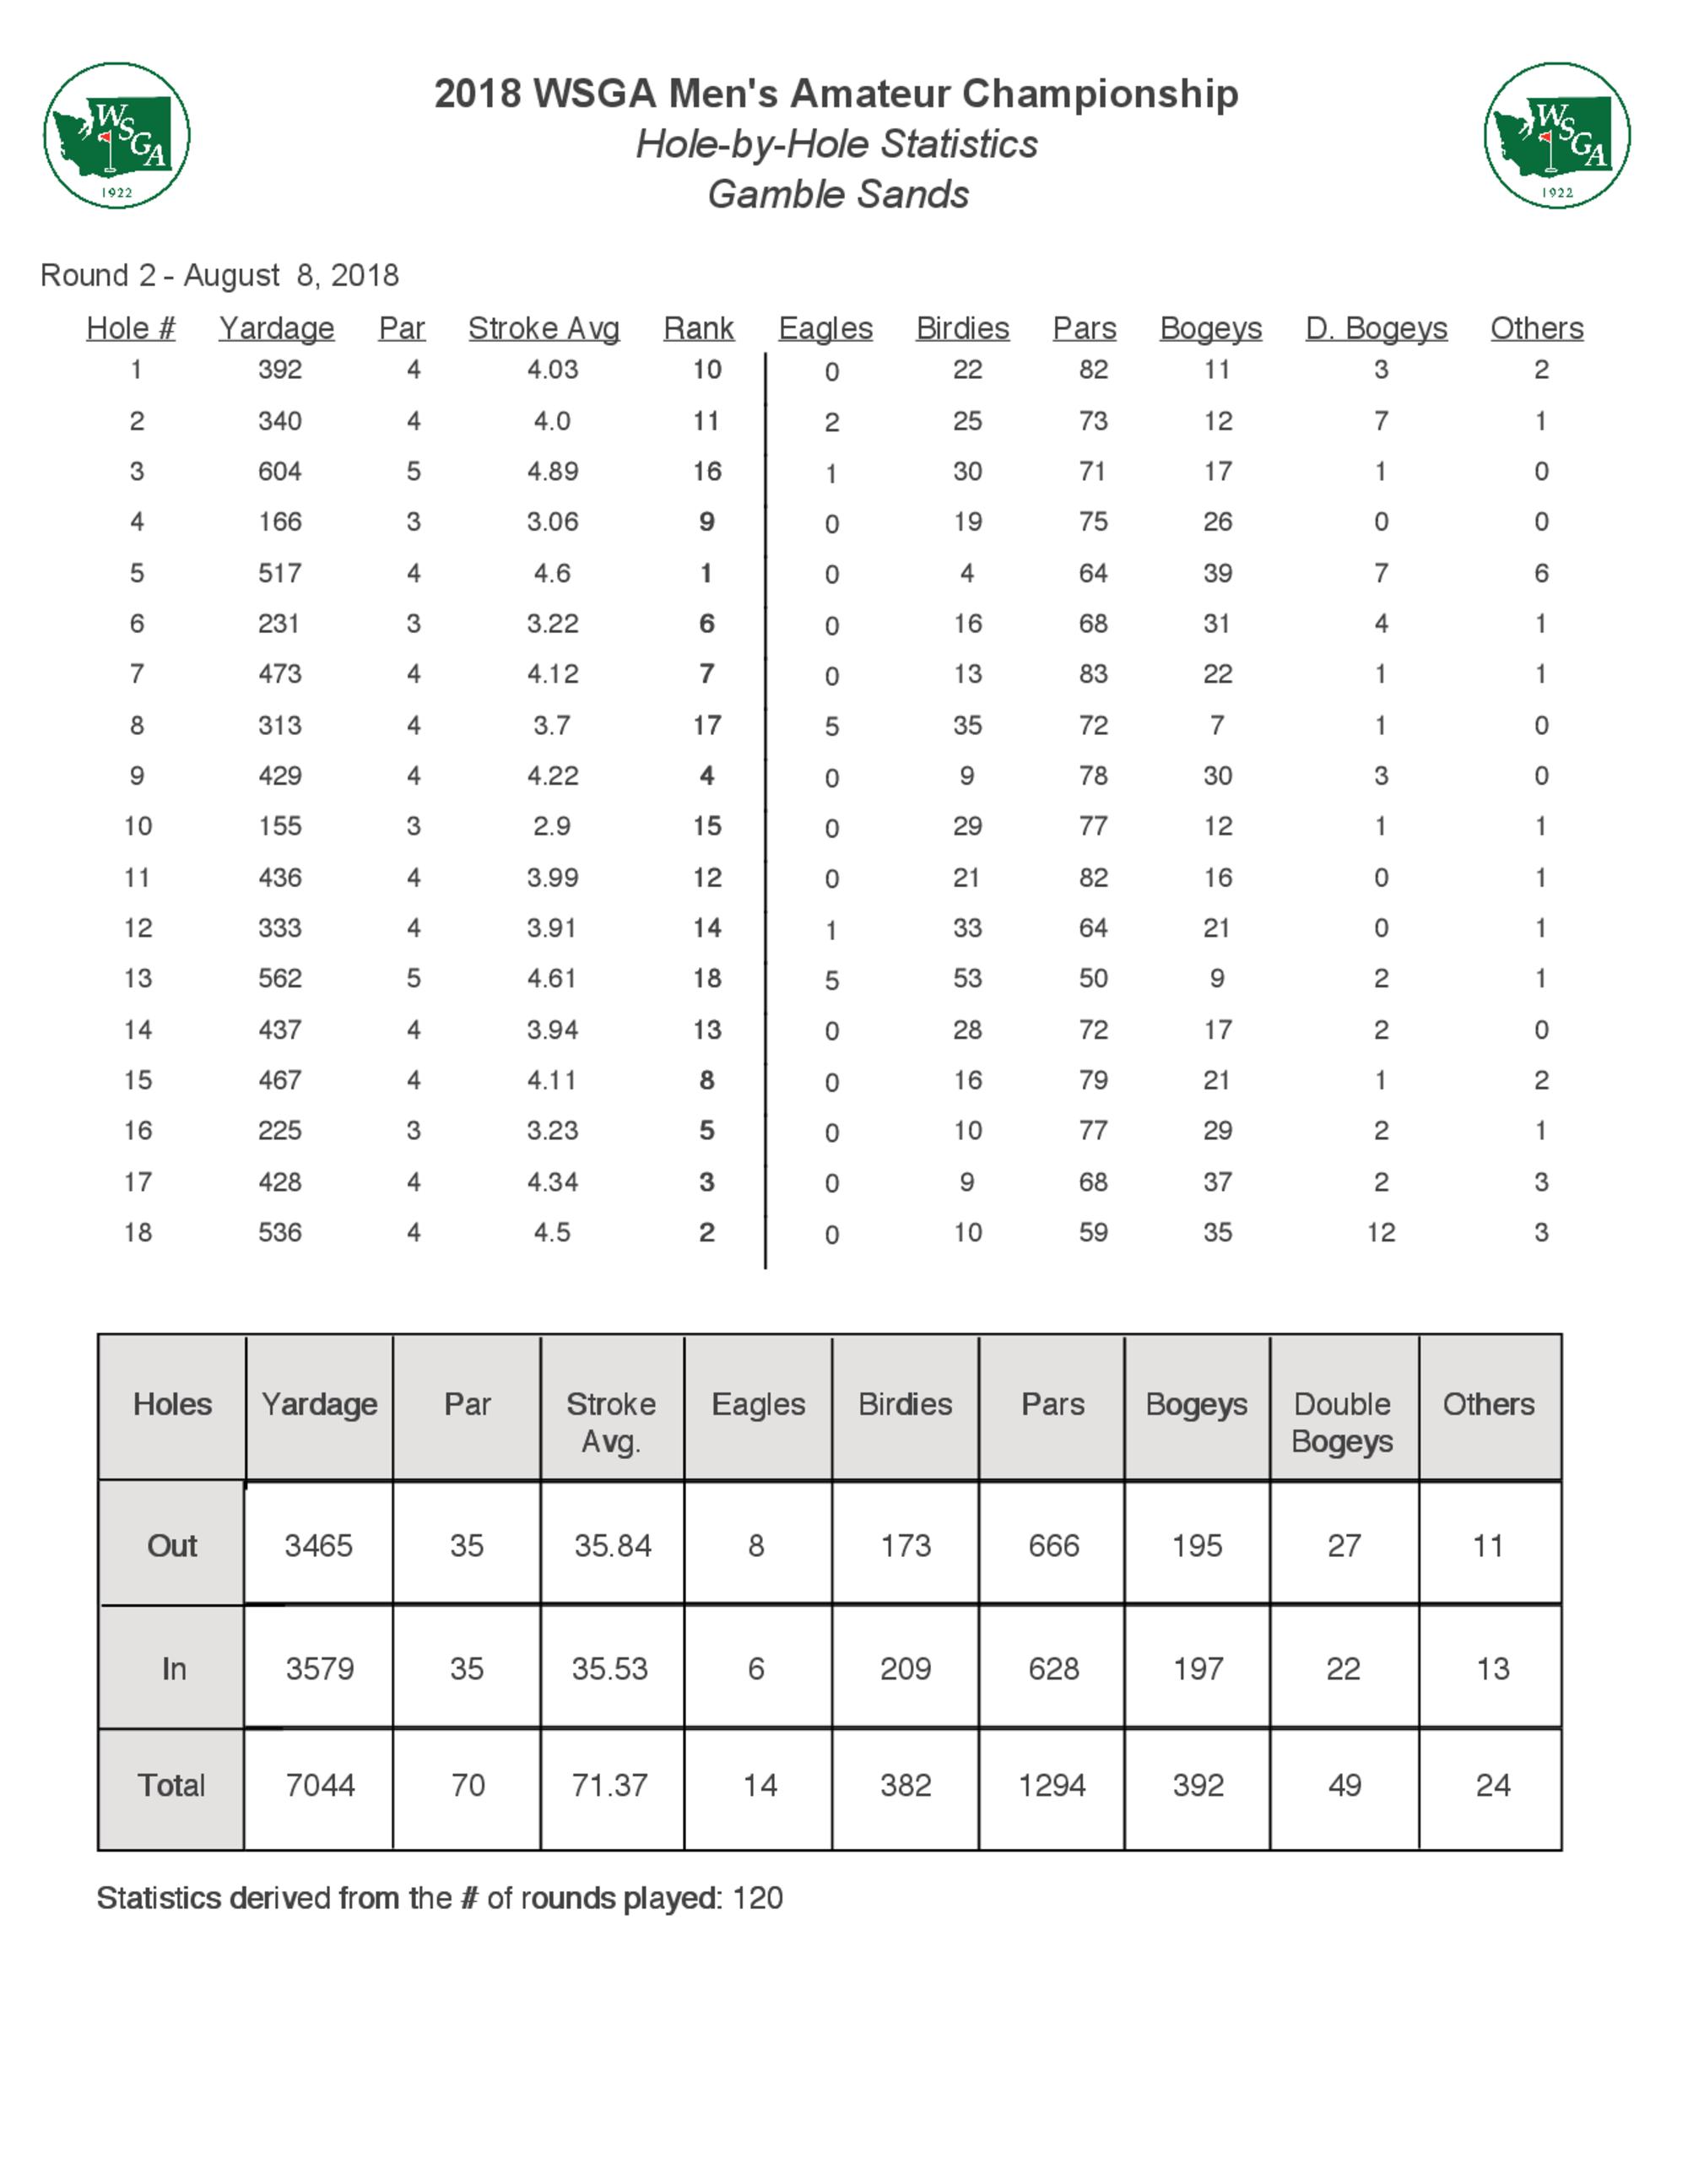 Round 2 course statistics 1